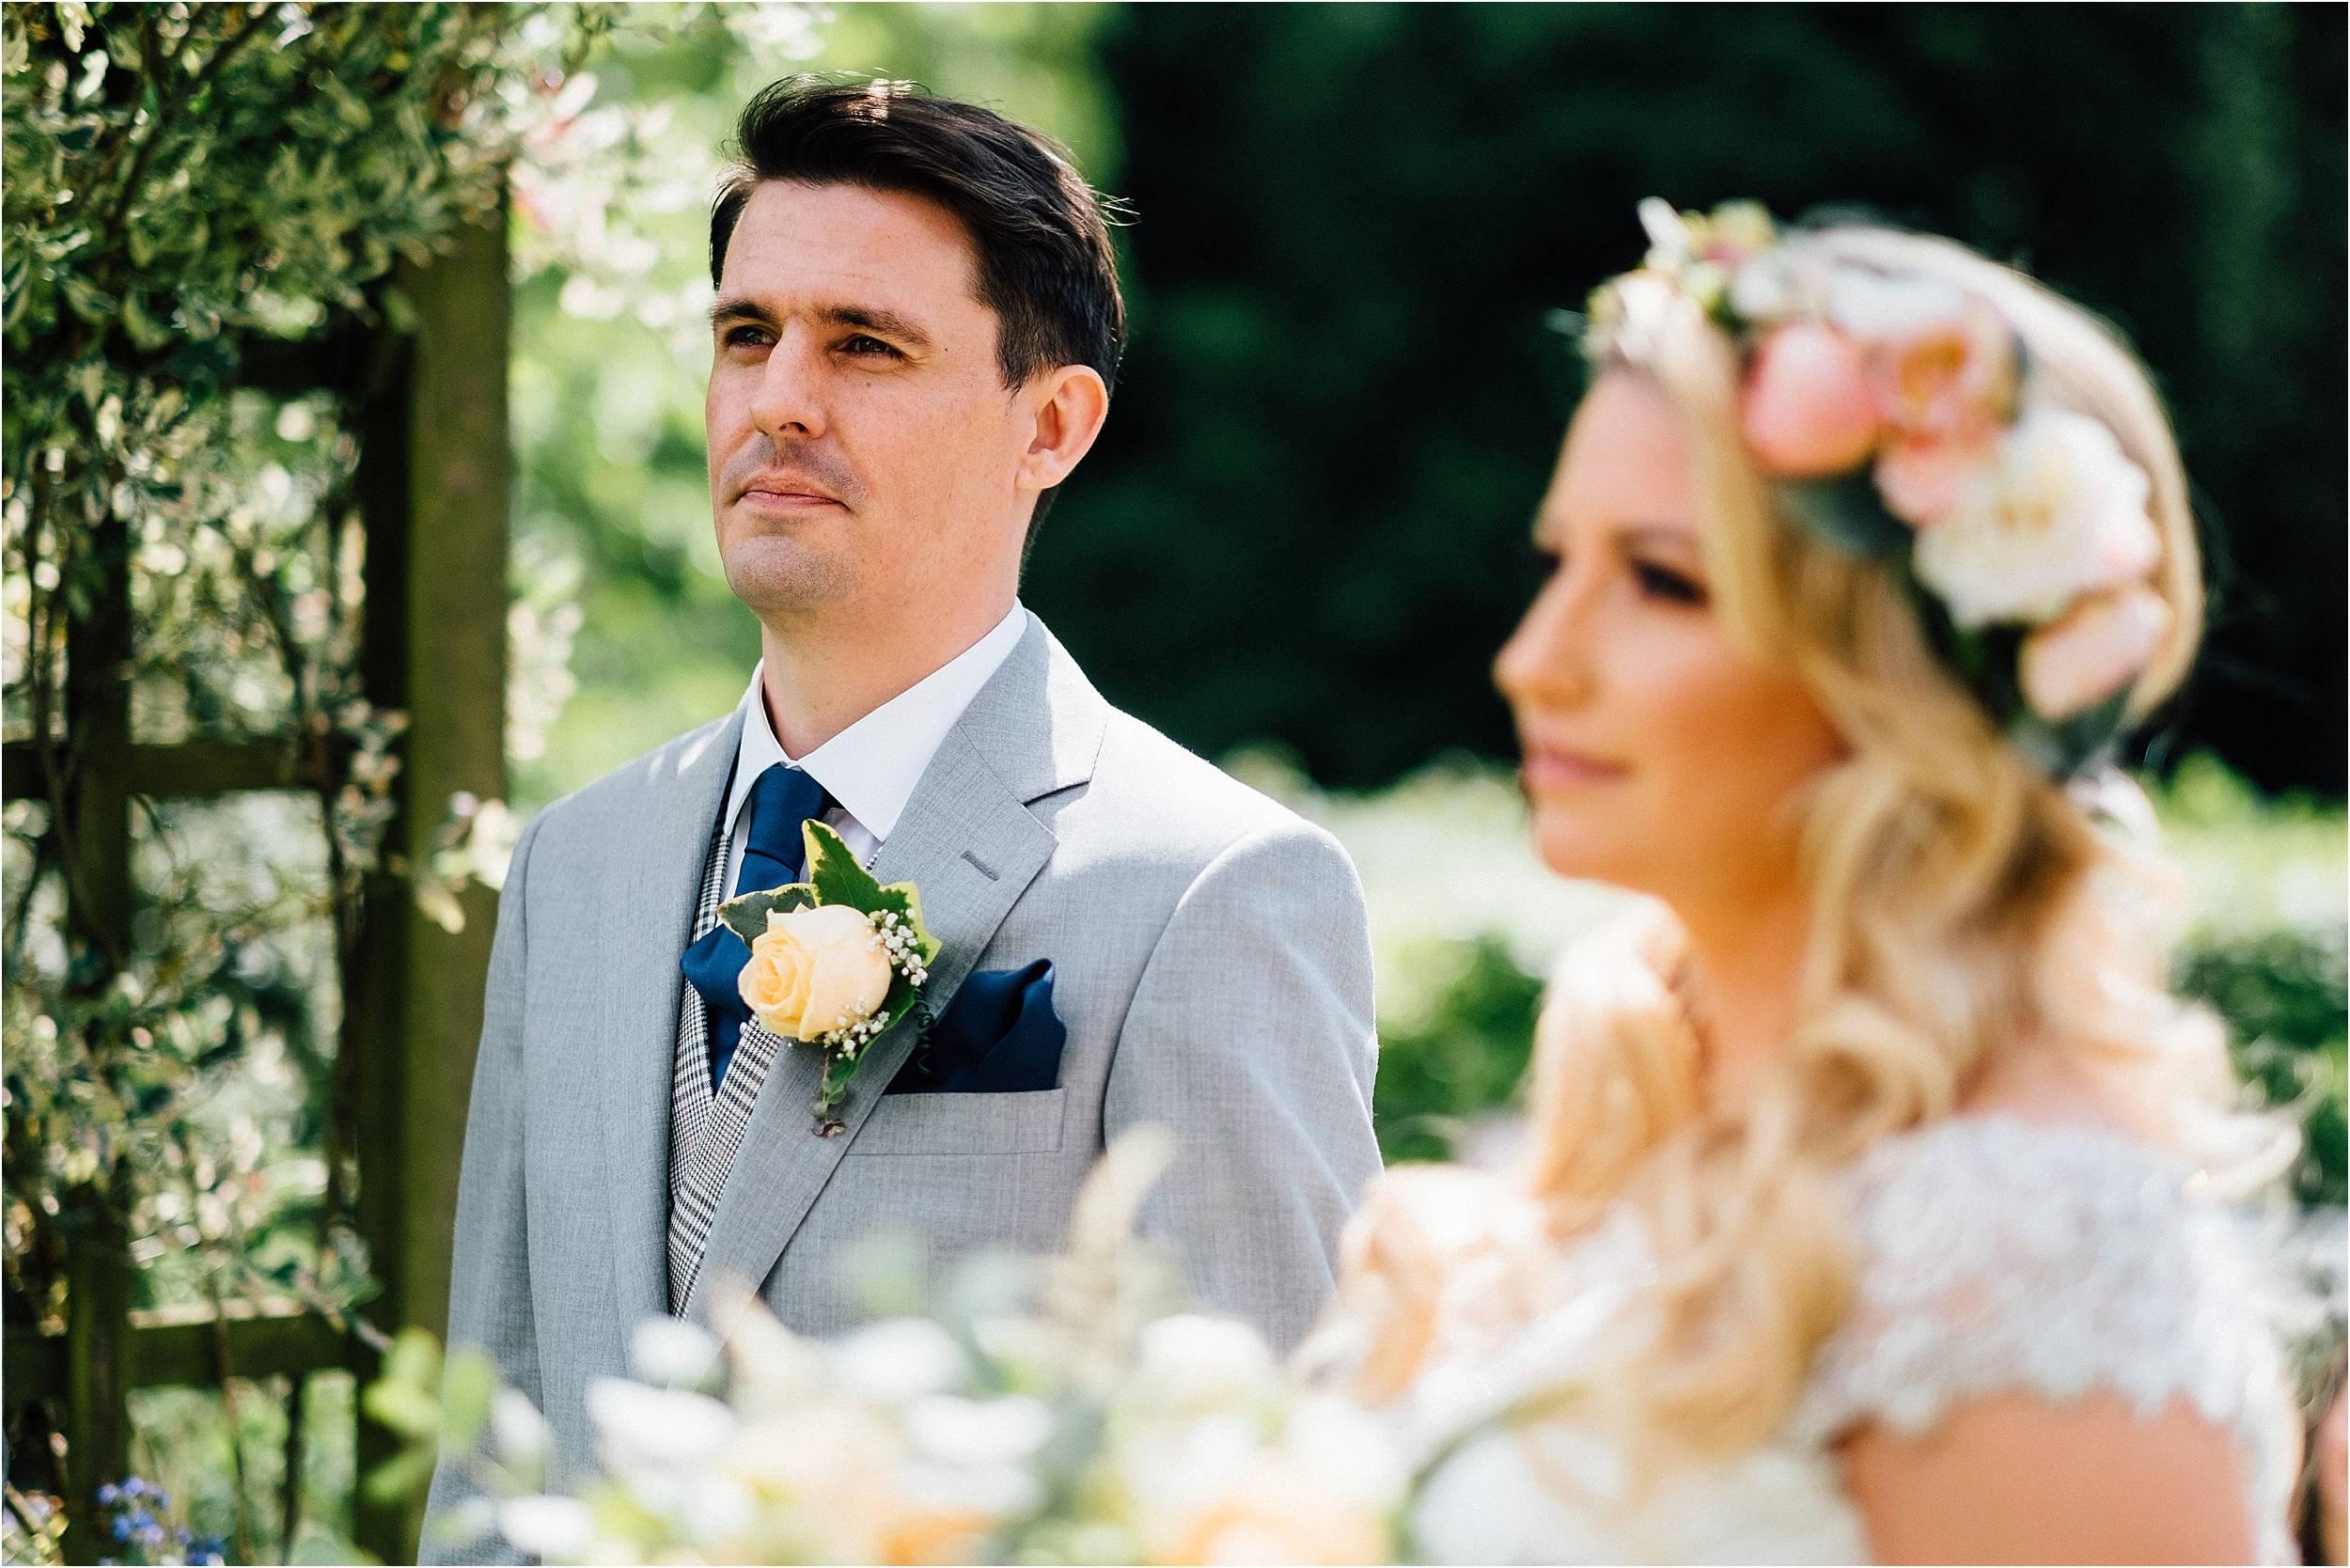 Surrey Hookhouse Farm Wedding Photographer_0053.jpg